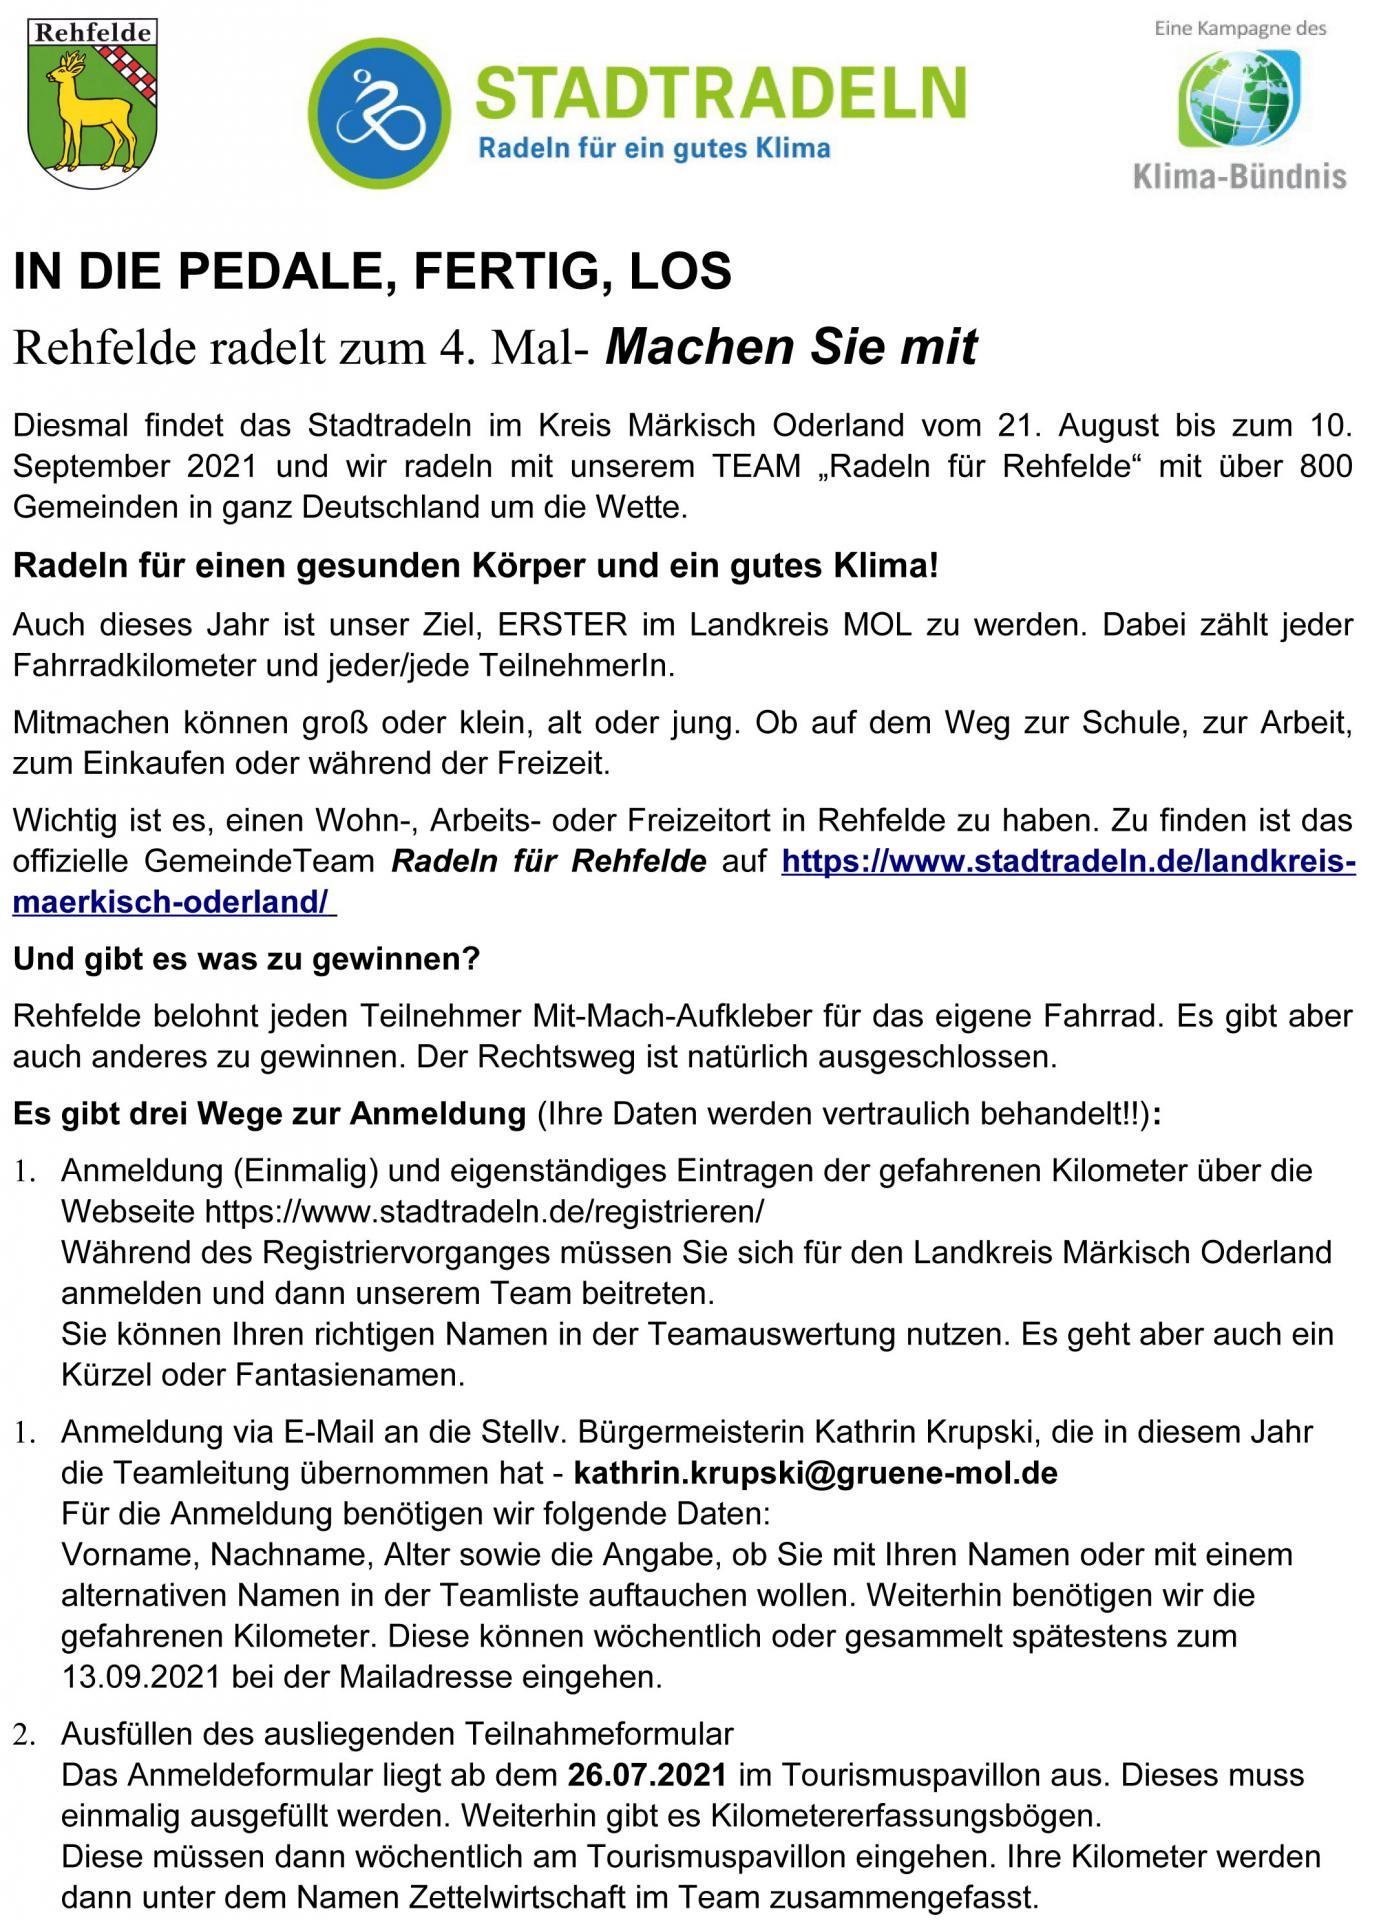 Stadtradeln_Radeln_fuer_Rehfelde_2021_1